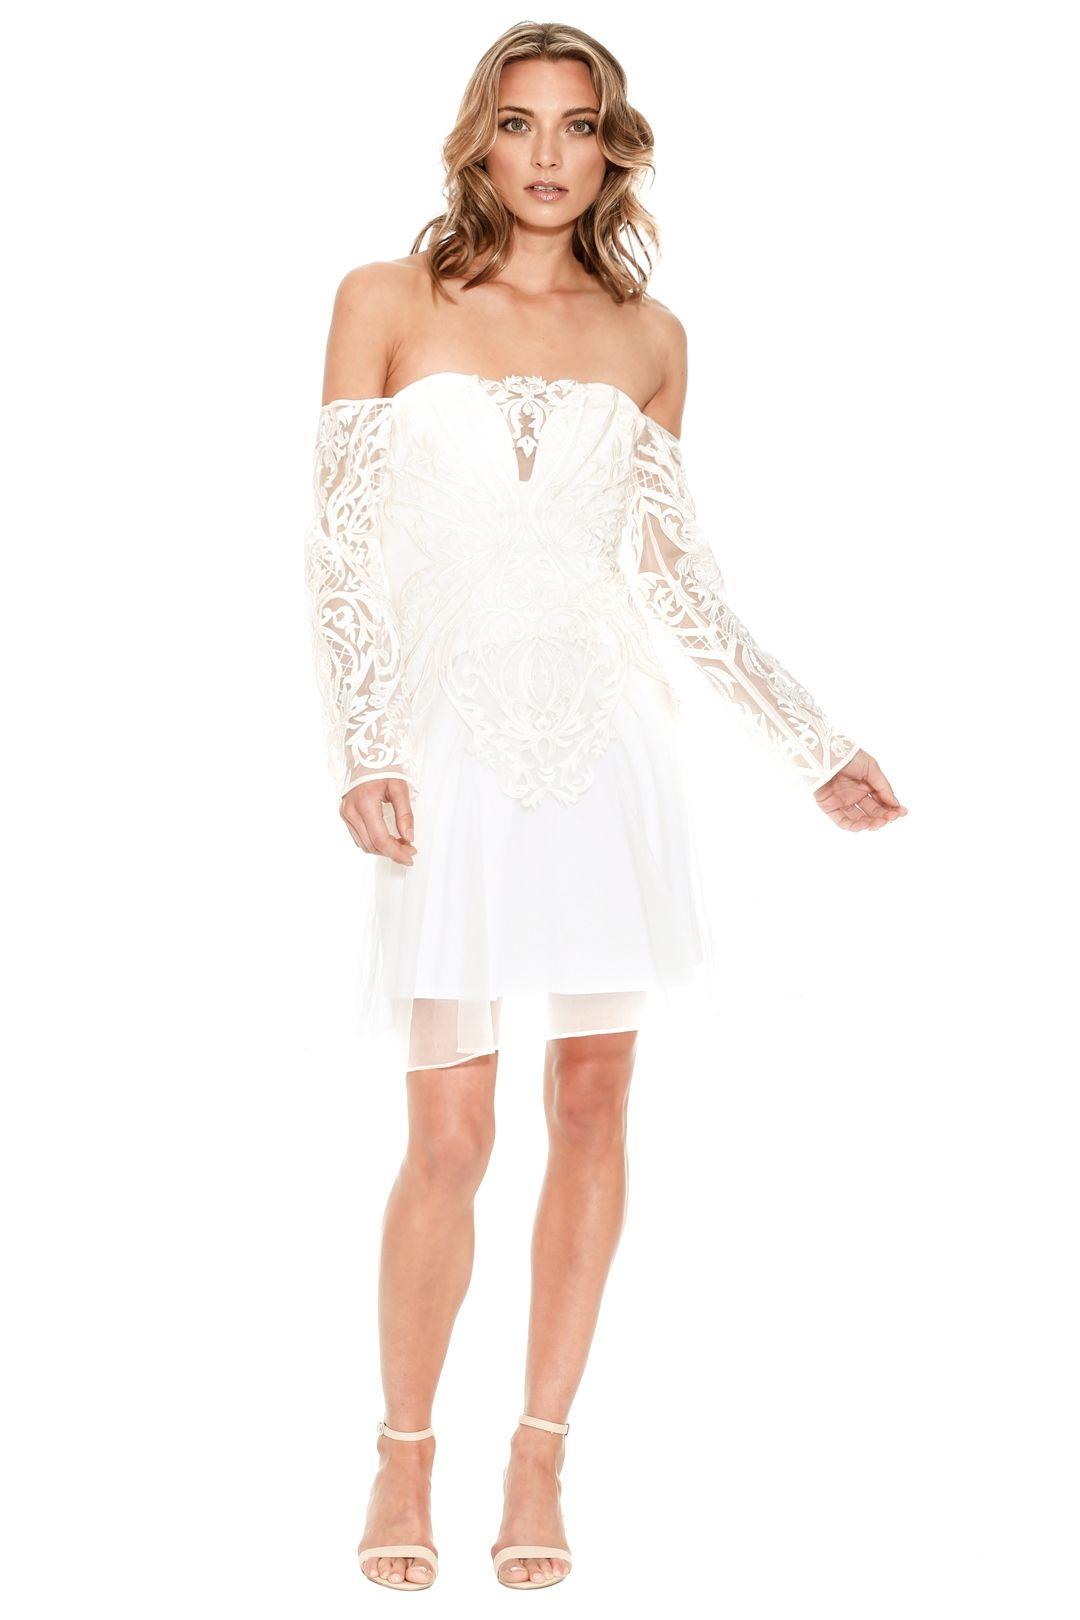 Thurley - Spanish Steps Dress - White - Front